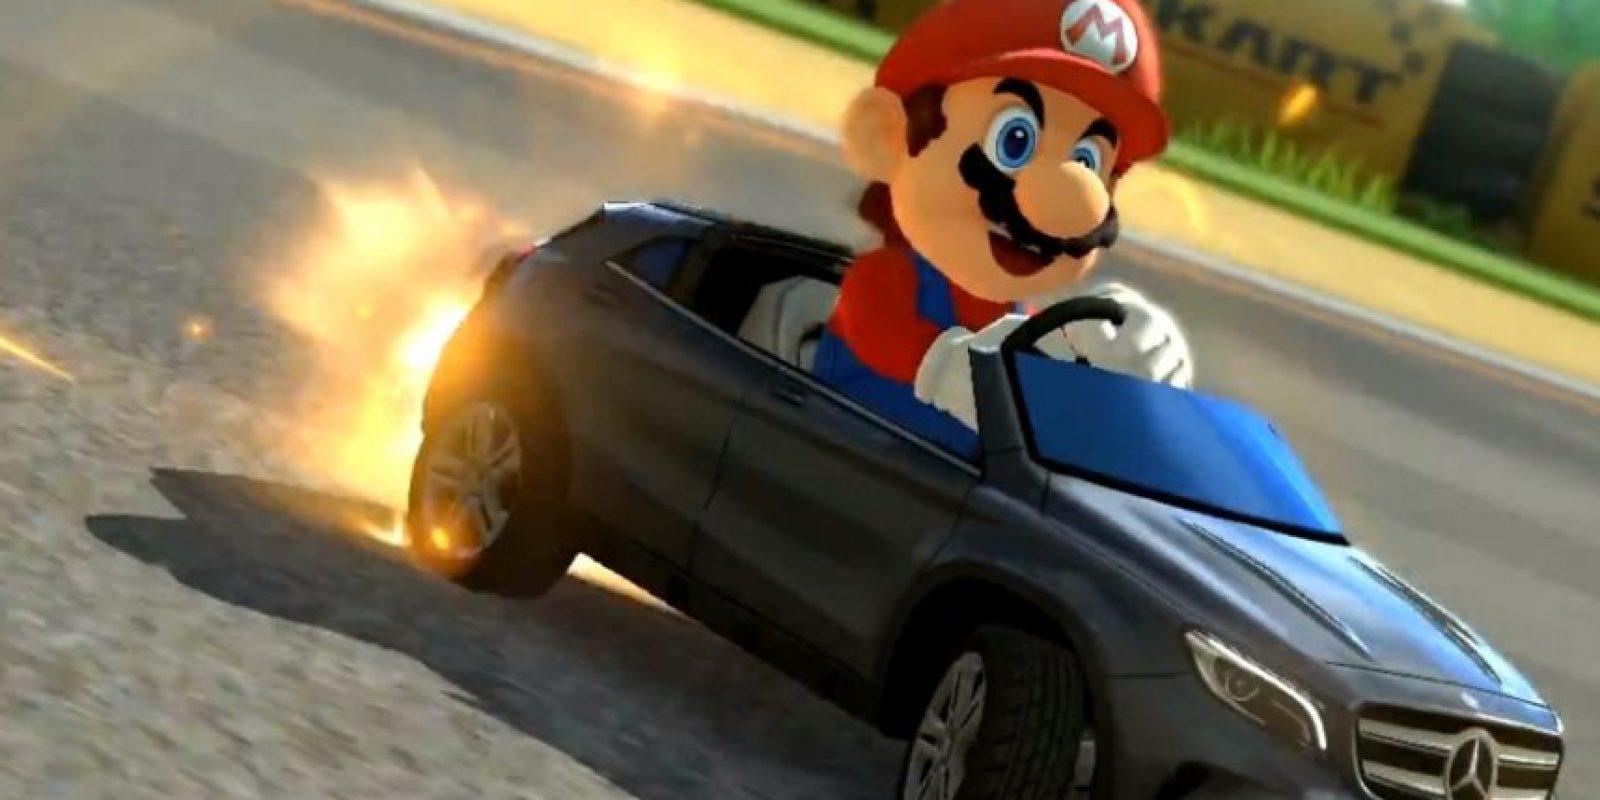 Mario compitiendo en un Mercedes-Benz. Foto:Mercedes-BenzTV